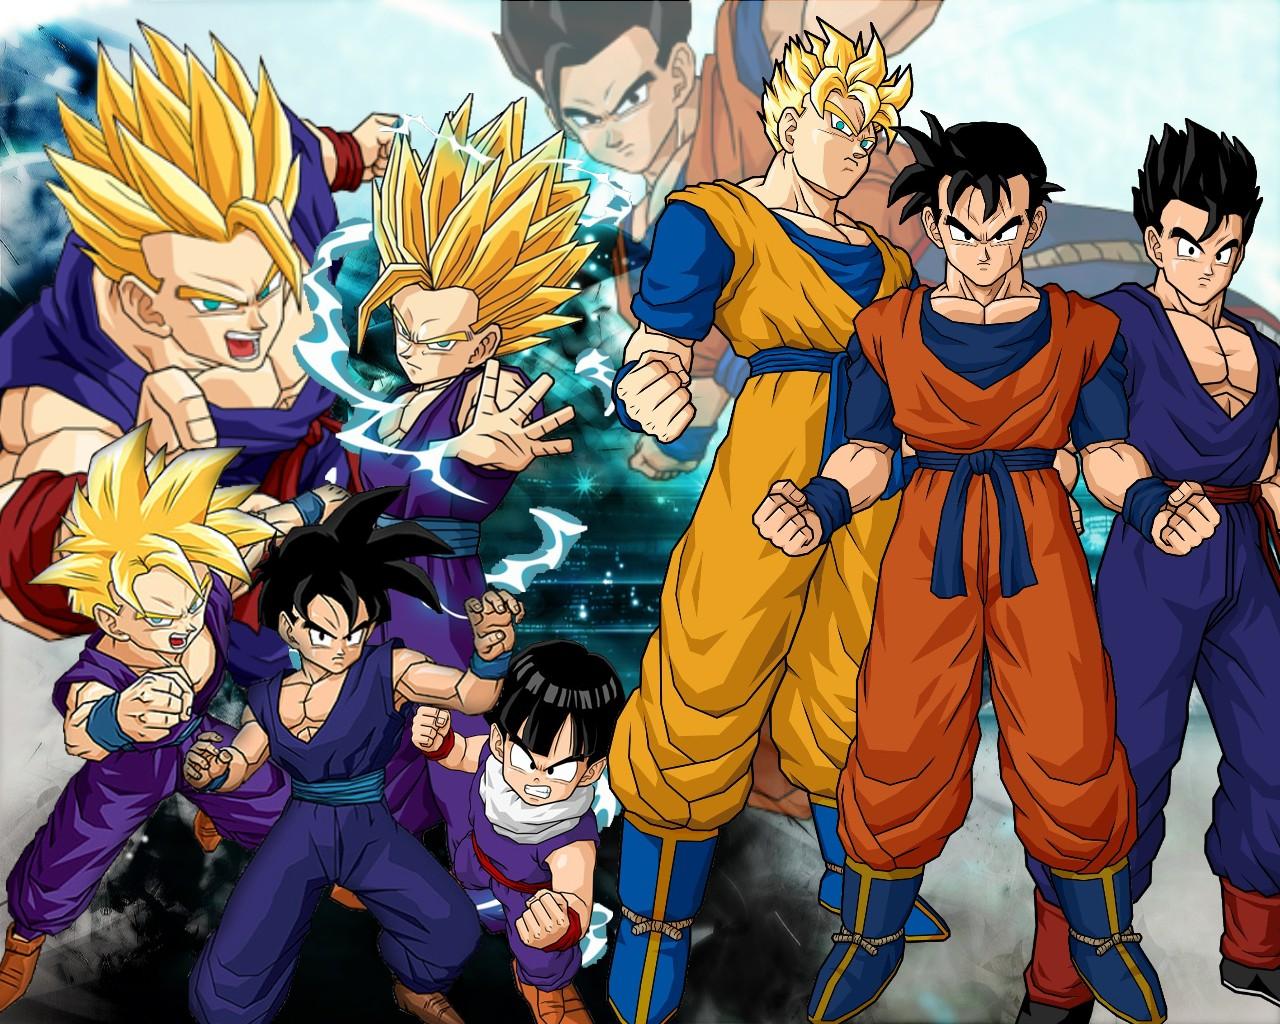 Imagenesde99 Imagenes De Goku Fase 10 Para Descargar: Imagenesde99: Imagenes De Goku Con Gohan